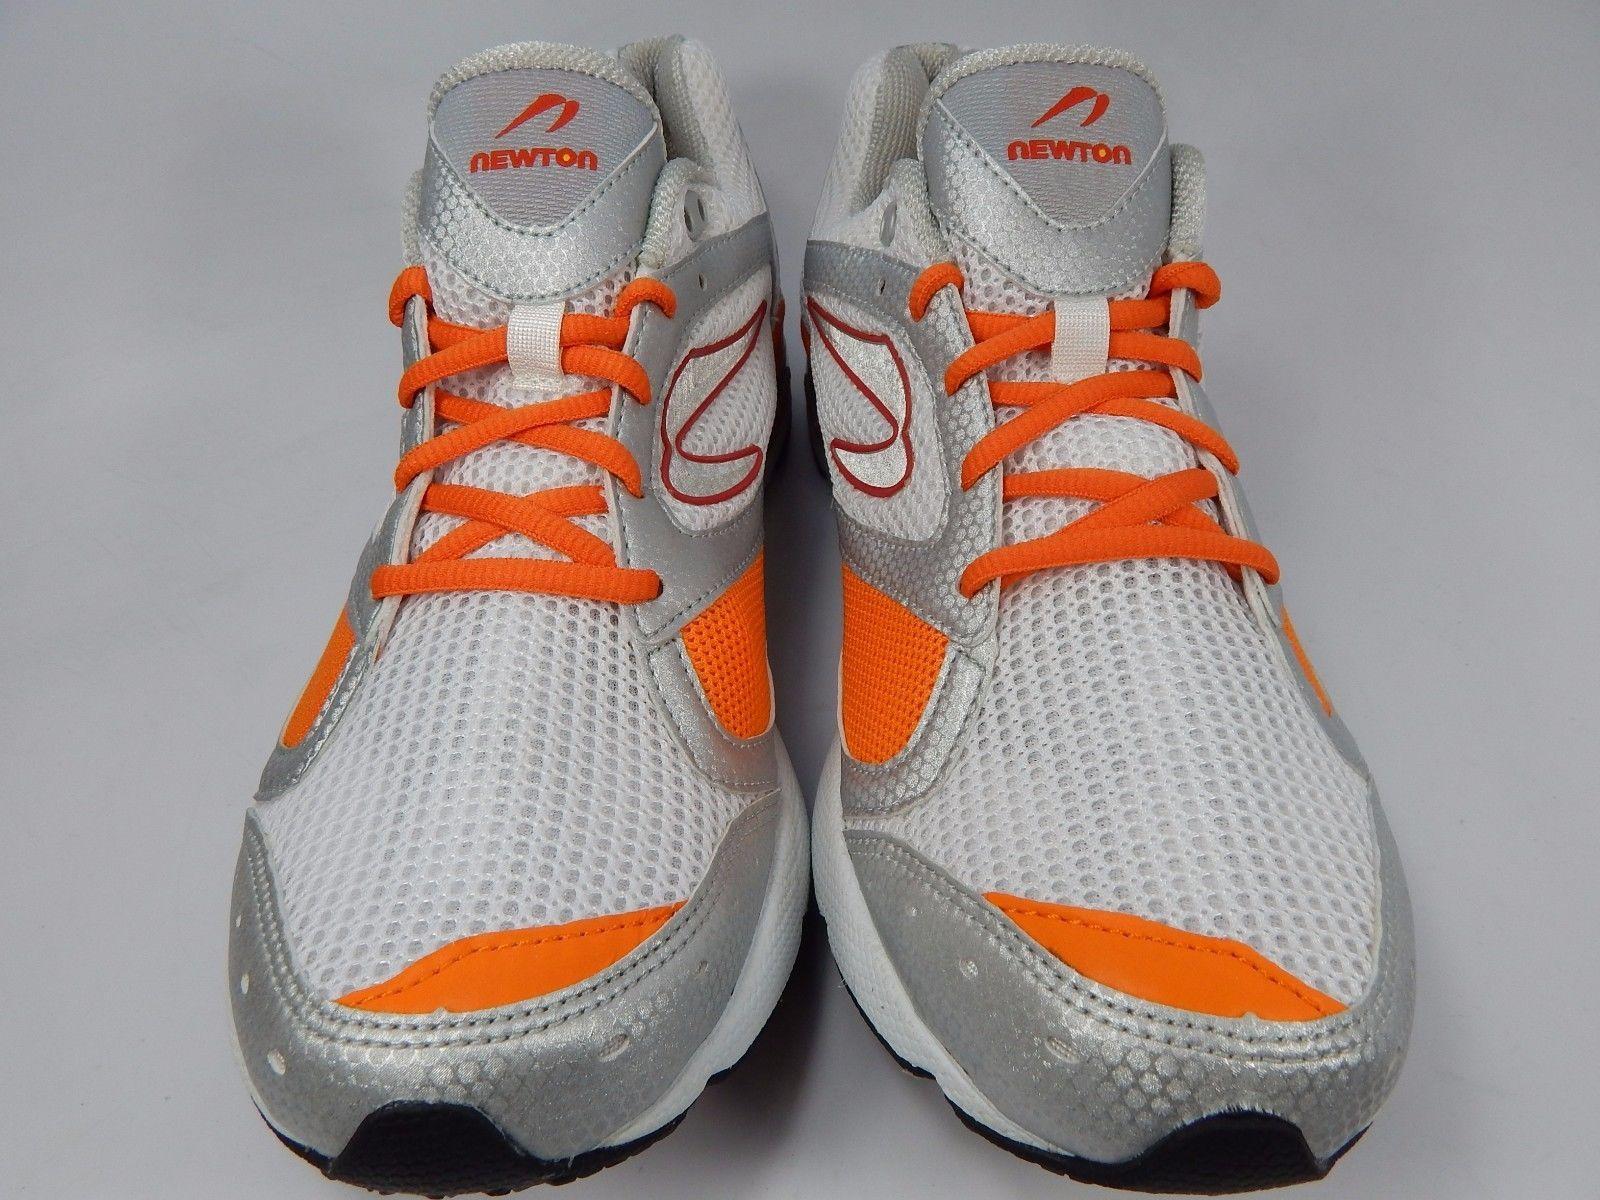 Newton Sir Isaac Neutral Men's Running Shoes Size US 9 M (D) EU 42 White Orange